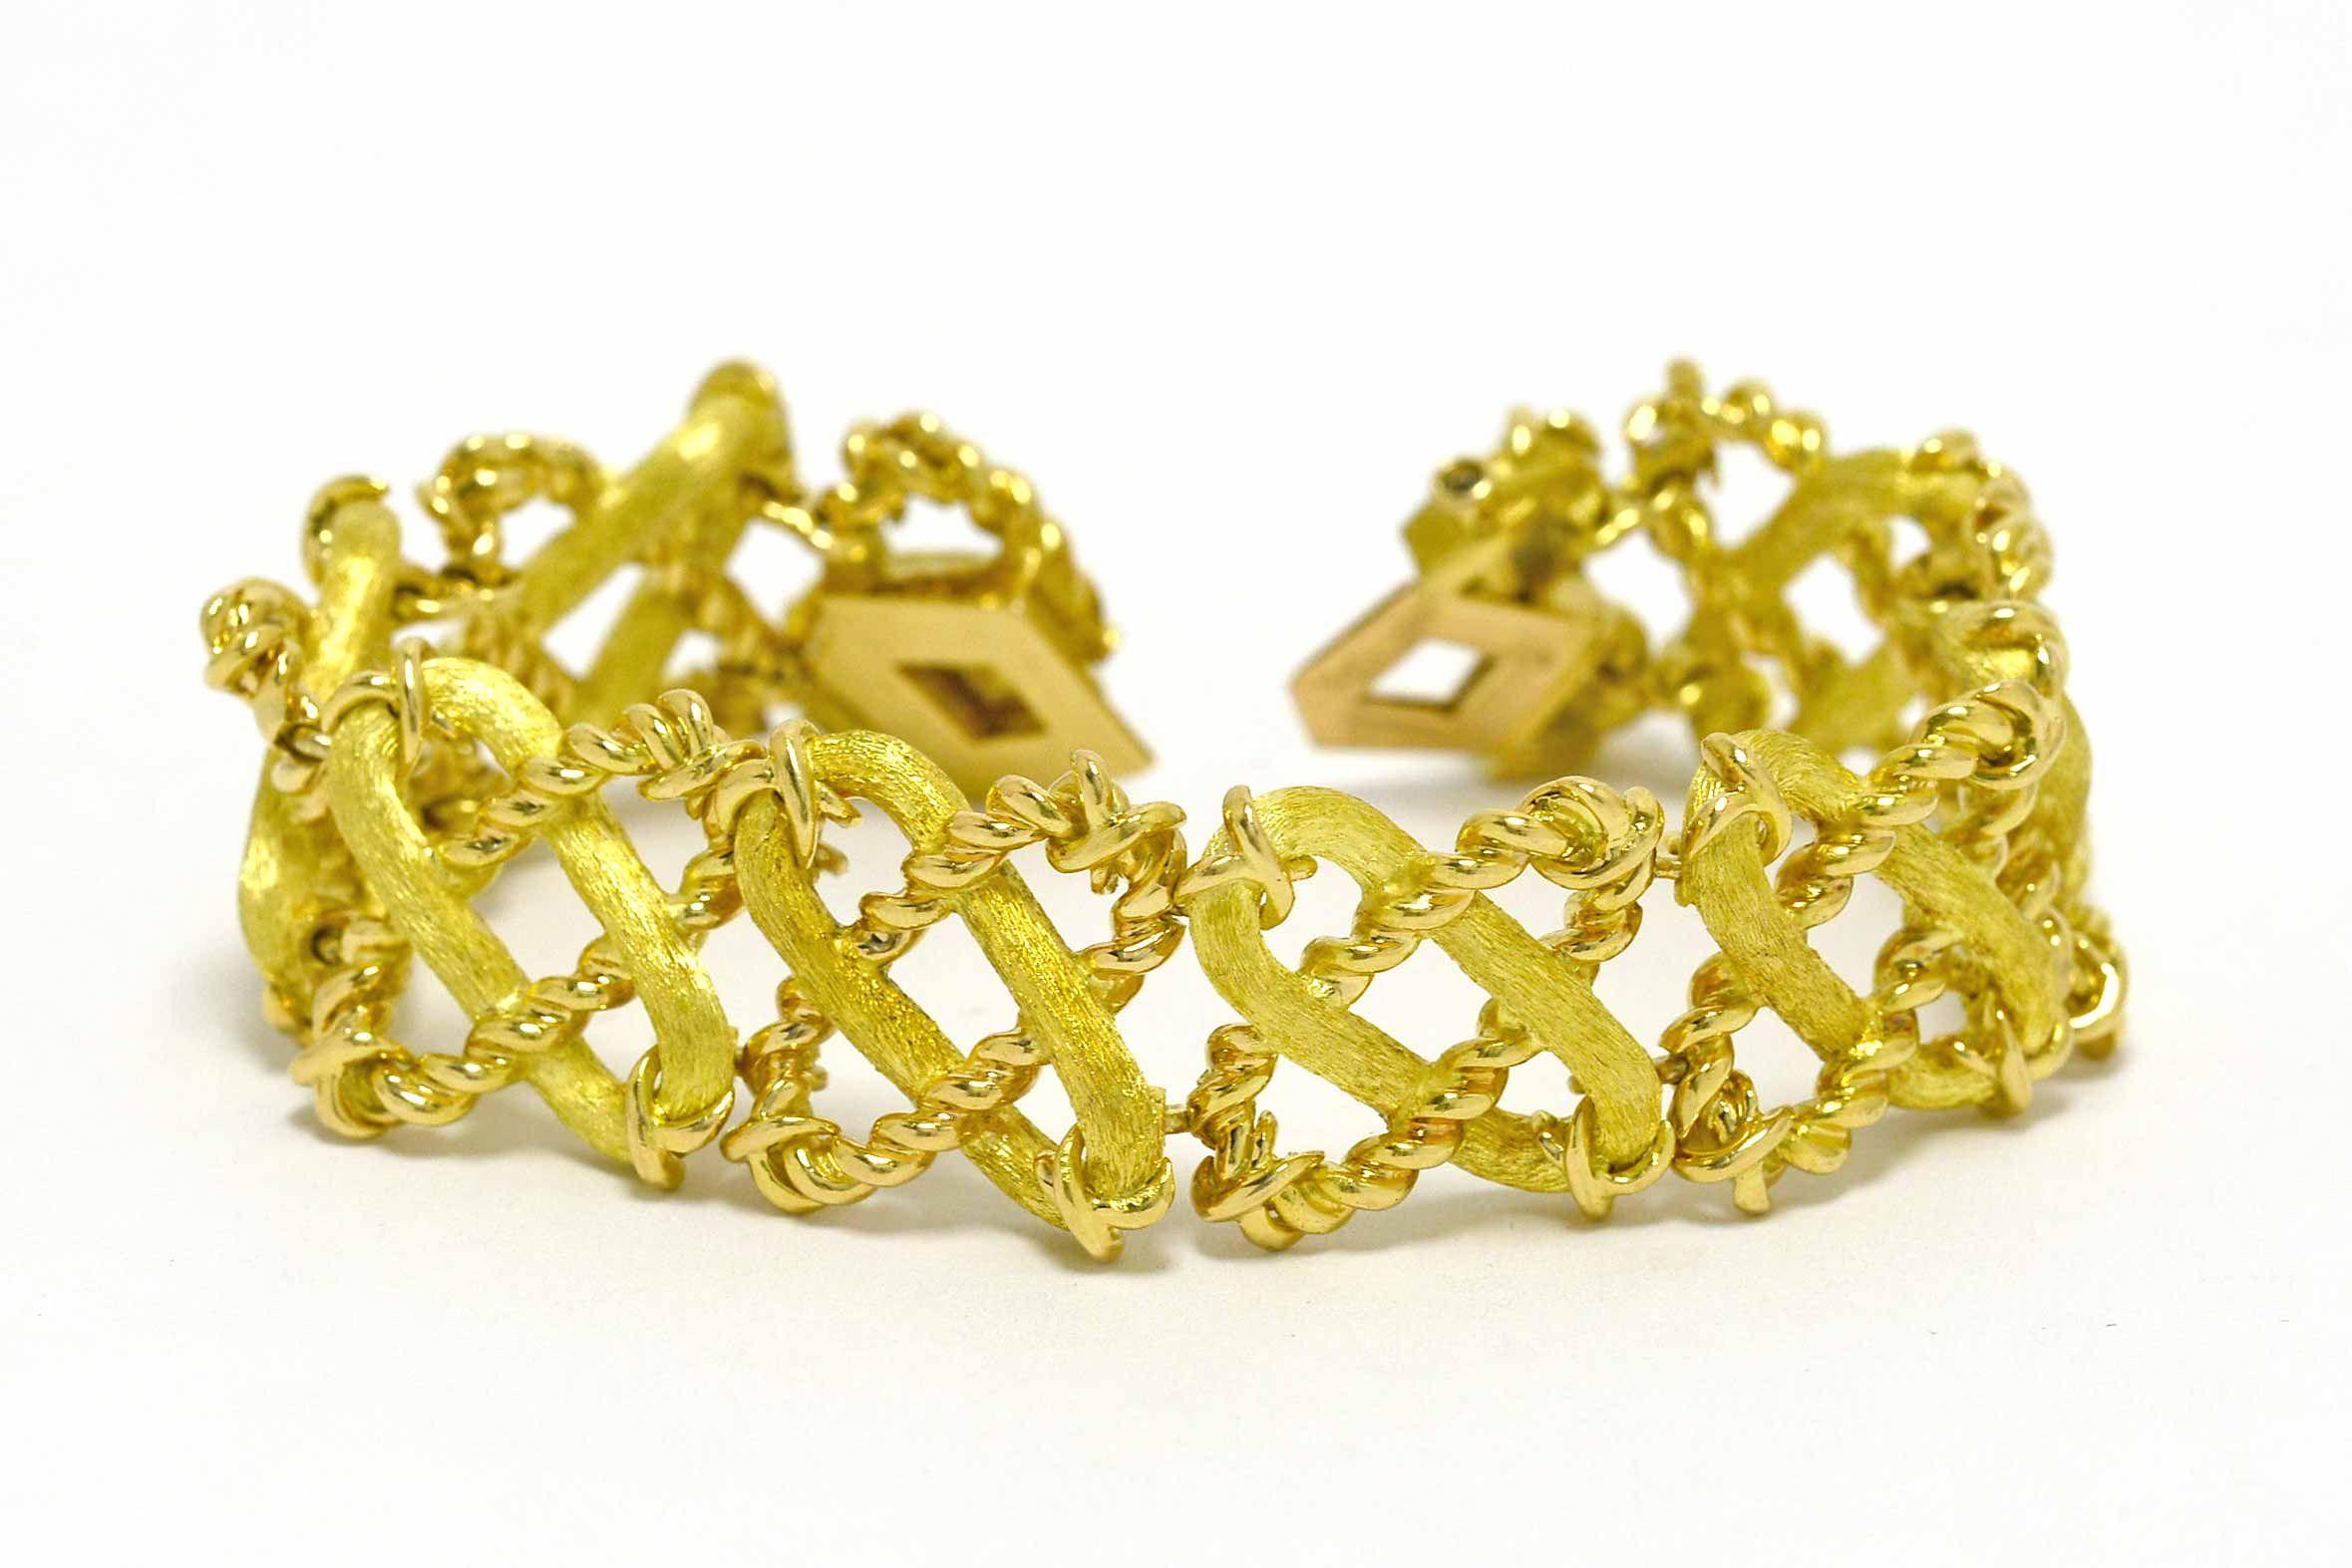 b8f2c165960 Tiffany Schlumberger Paris 18K Gold Link Bracelet Slide Lock Modernist  Jewelry